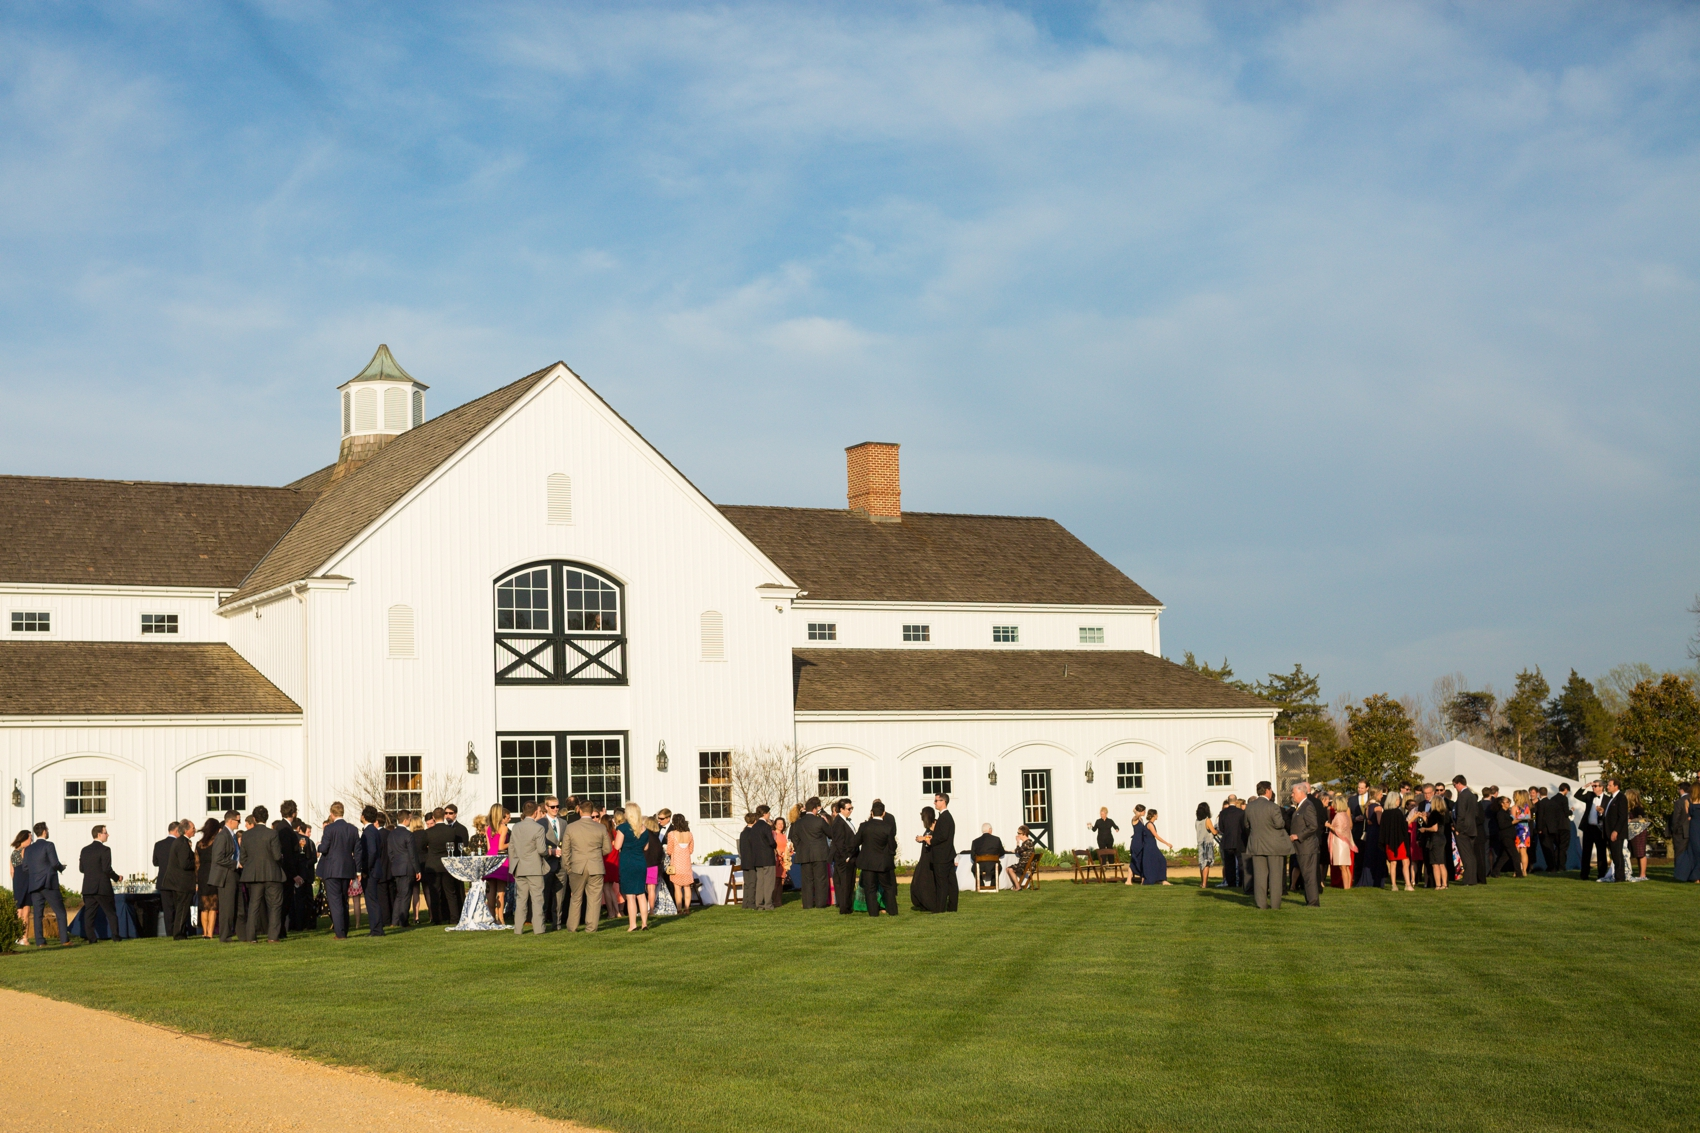 Castle-Hill-Virginia-Wedding-2019-0789.jpg